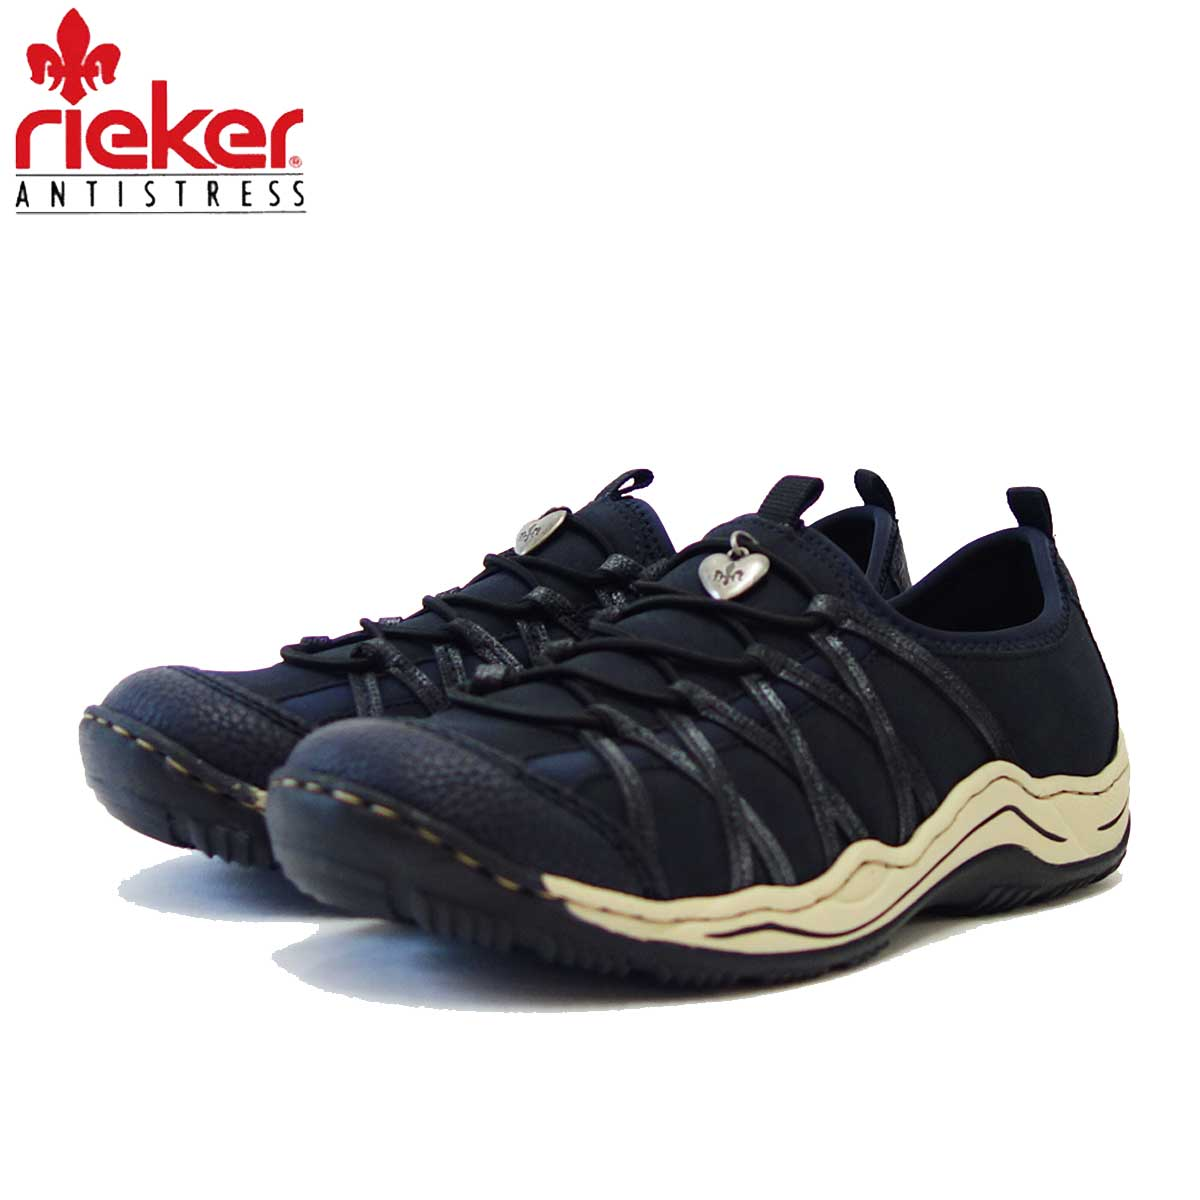 rieker リーカー 0559 15 ネイビーブルー クッション性の良いお洒落スニーカー 「靴」